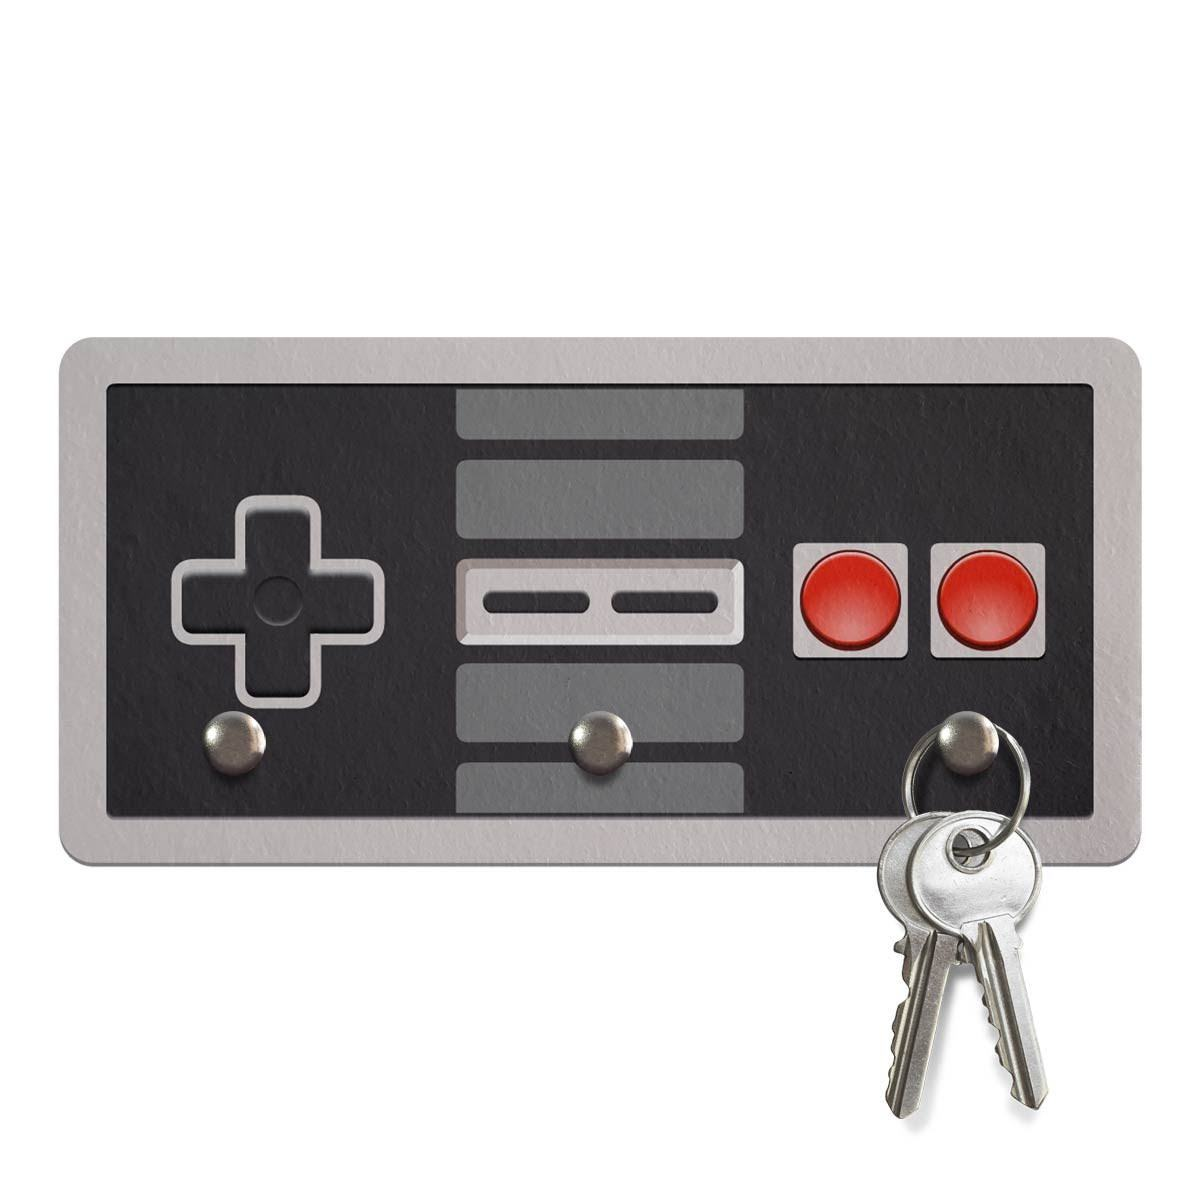 Porta Chaves Ecologico Joystick 8-Bits